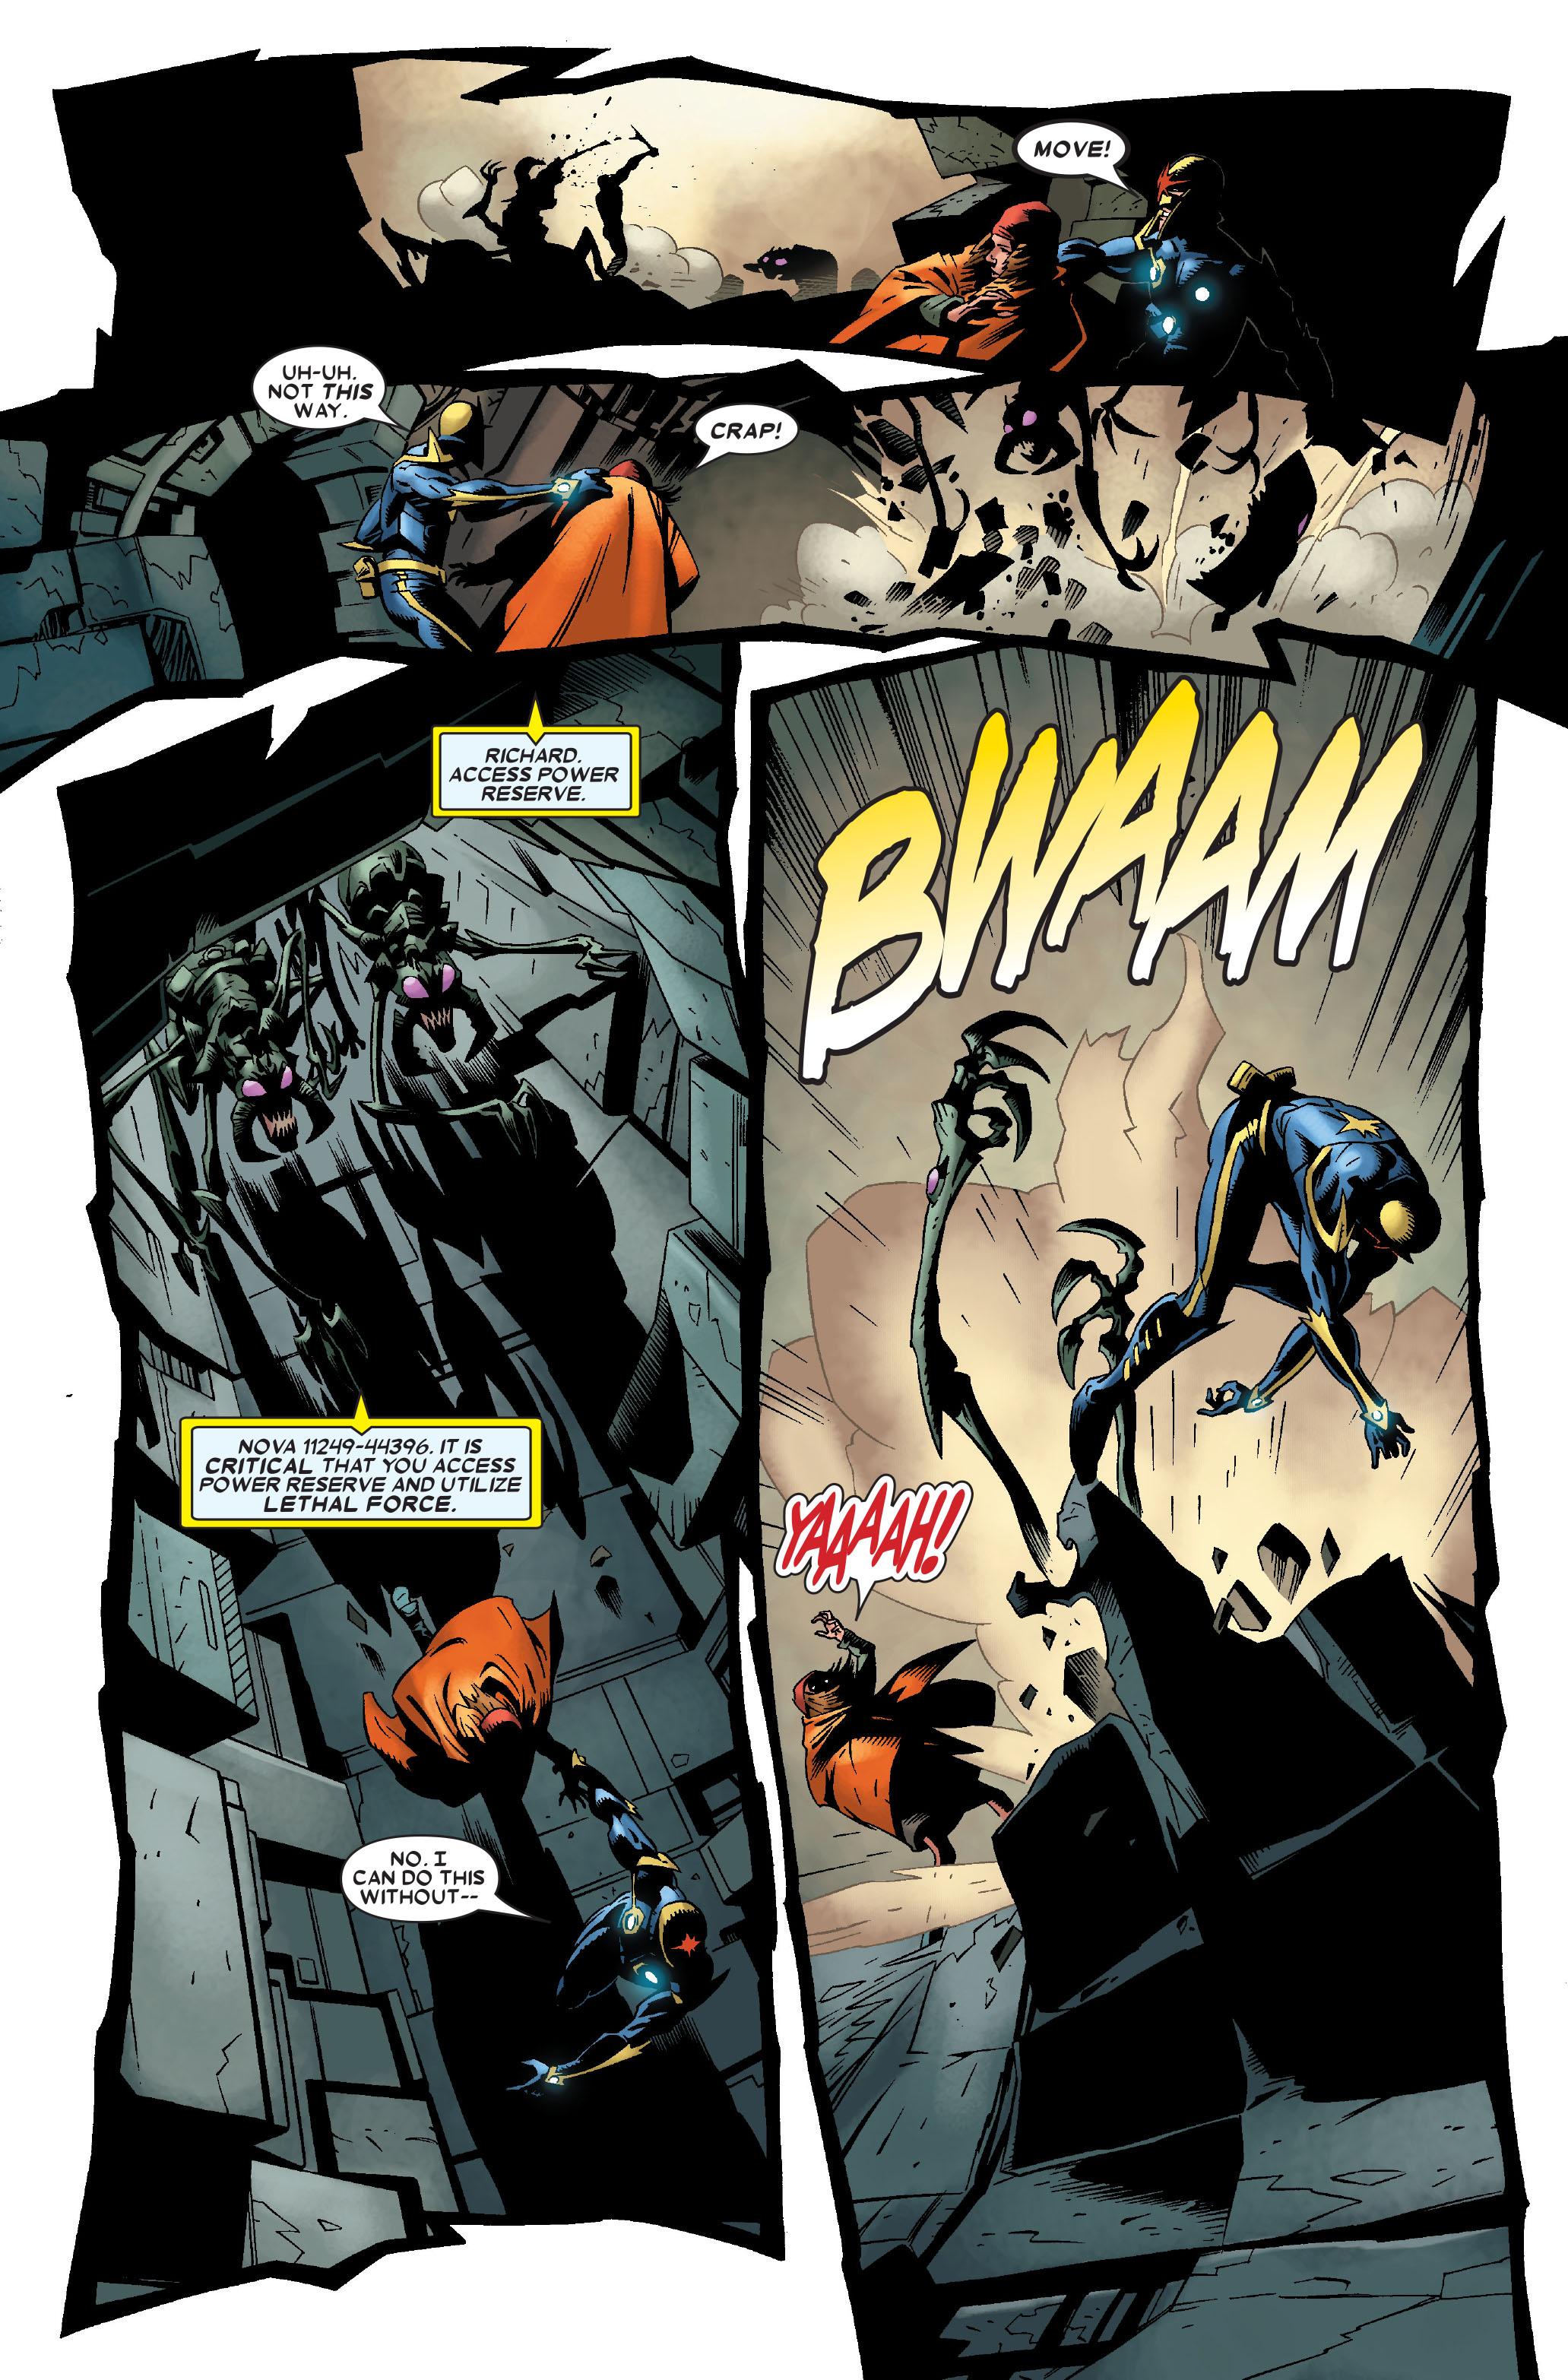 Read online Annihilation: Nova comic -  Issue #2 - 11